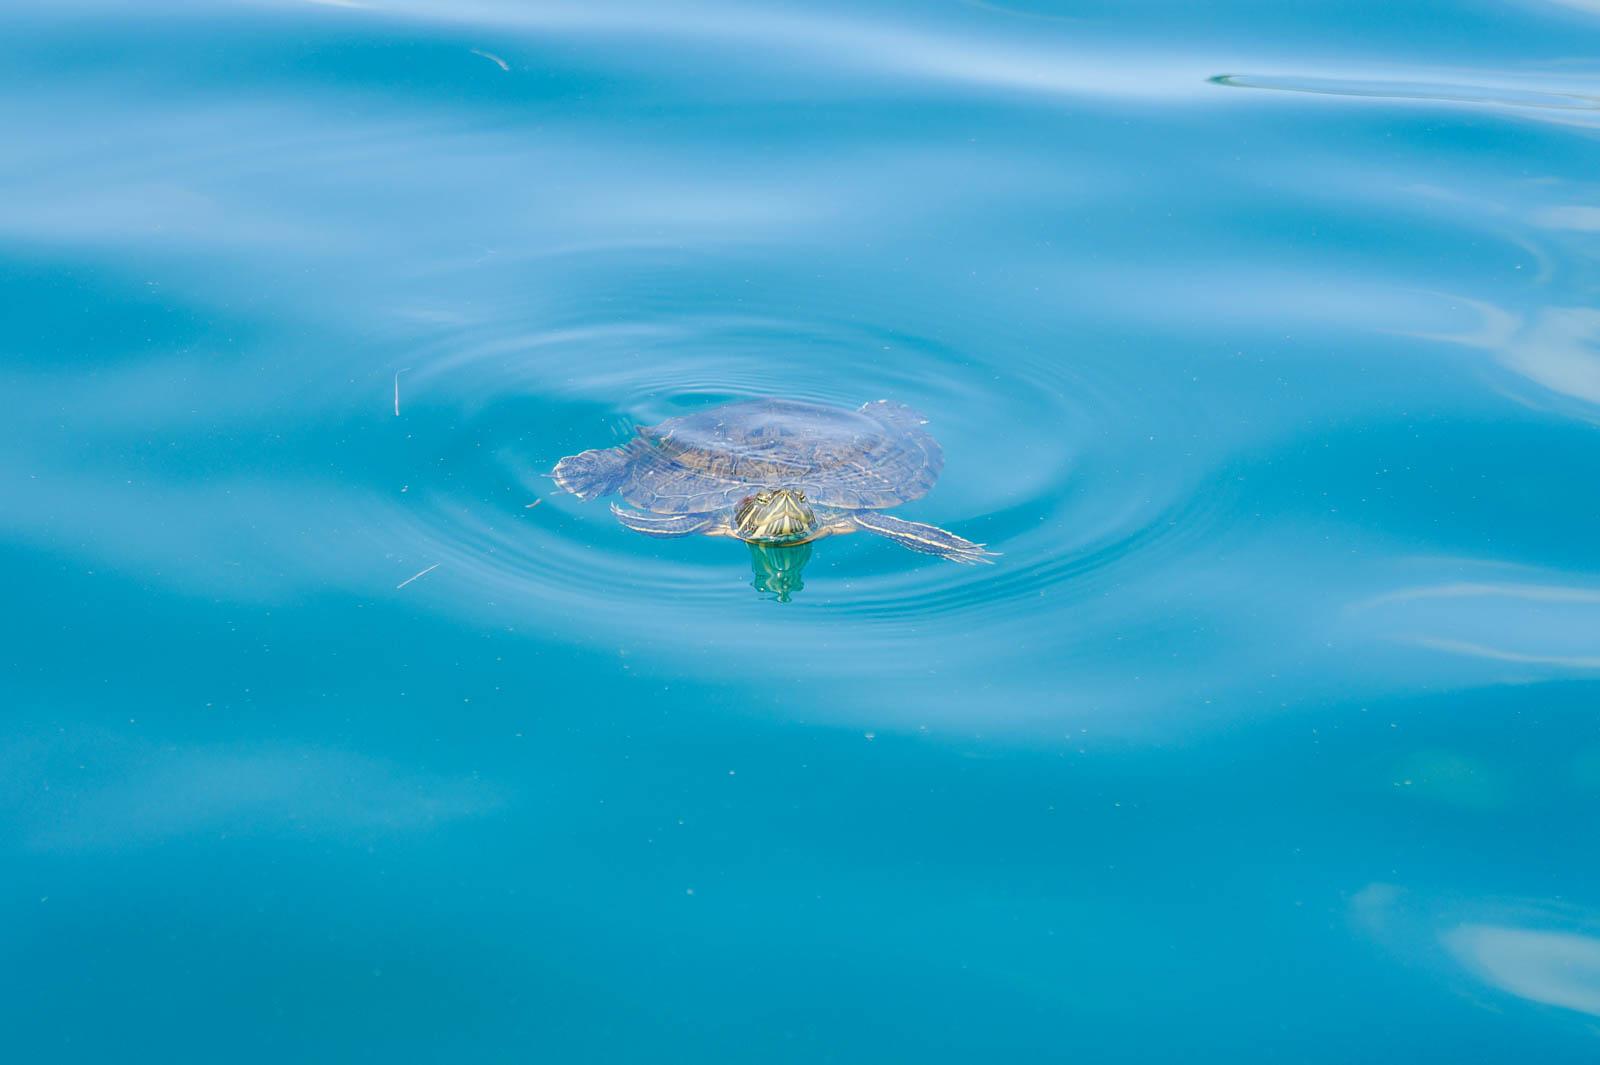 kourna-lake-crete-greece-la-vie-en-blog-all-rights-reserved-12